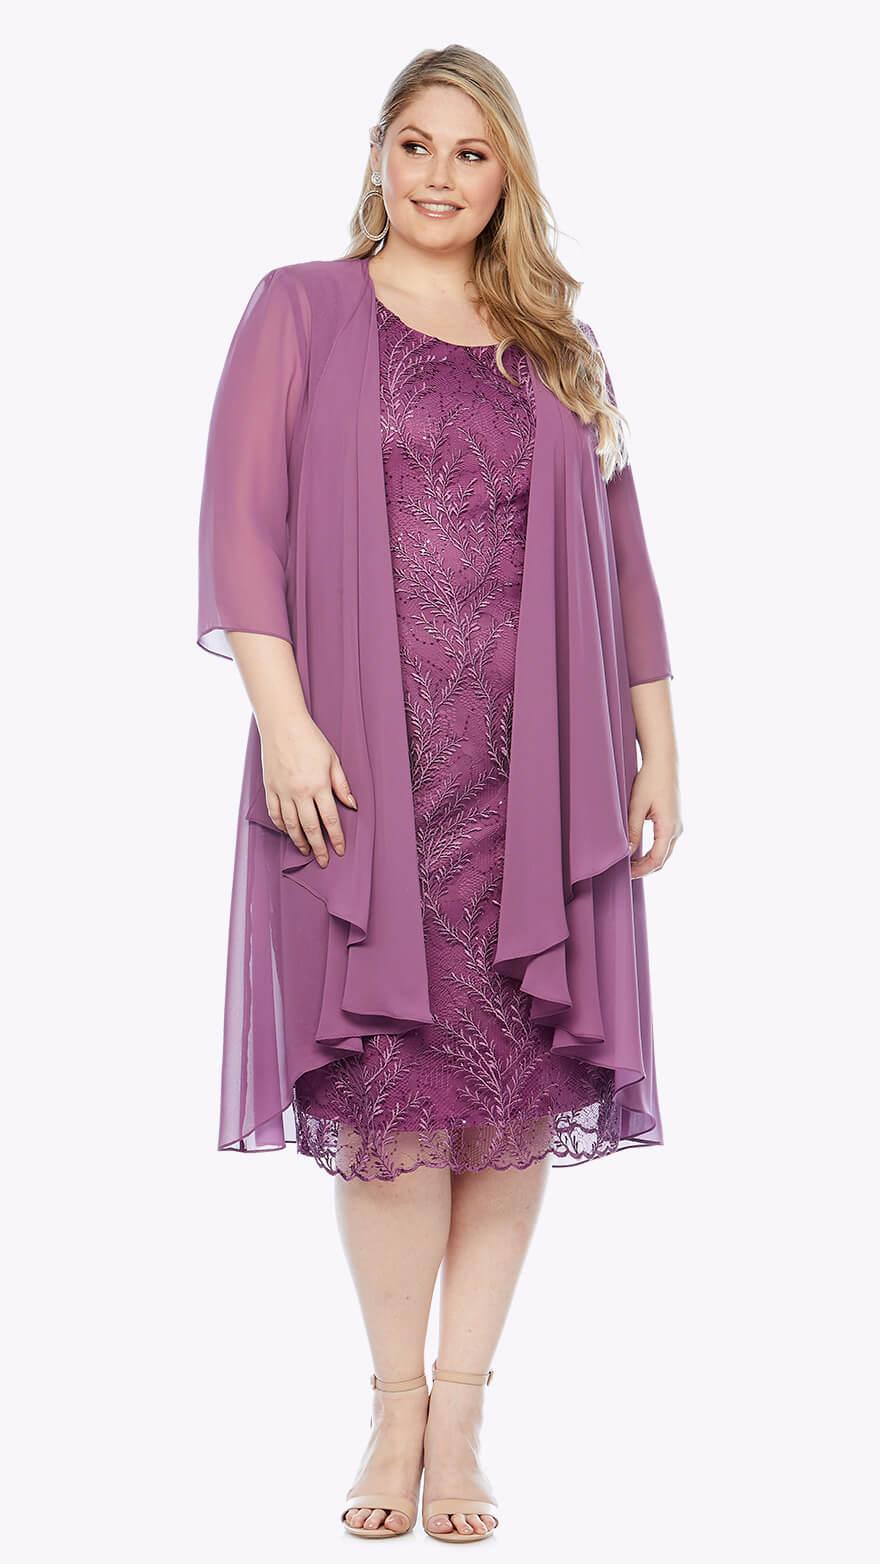 LJ0345 Embroidered lace dress with long chiffon jacket